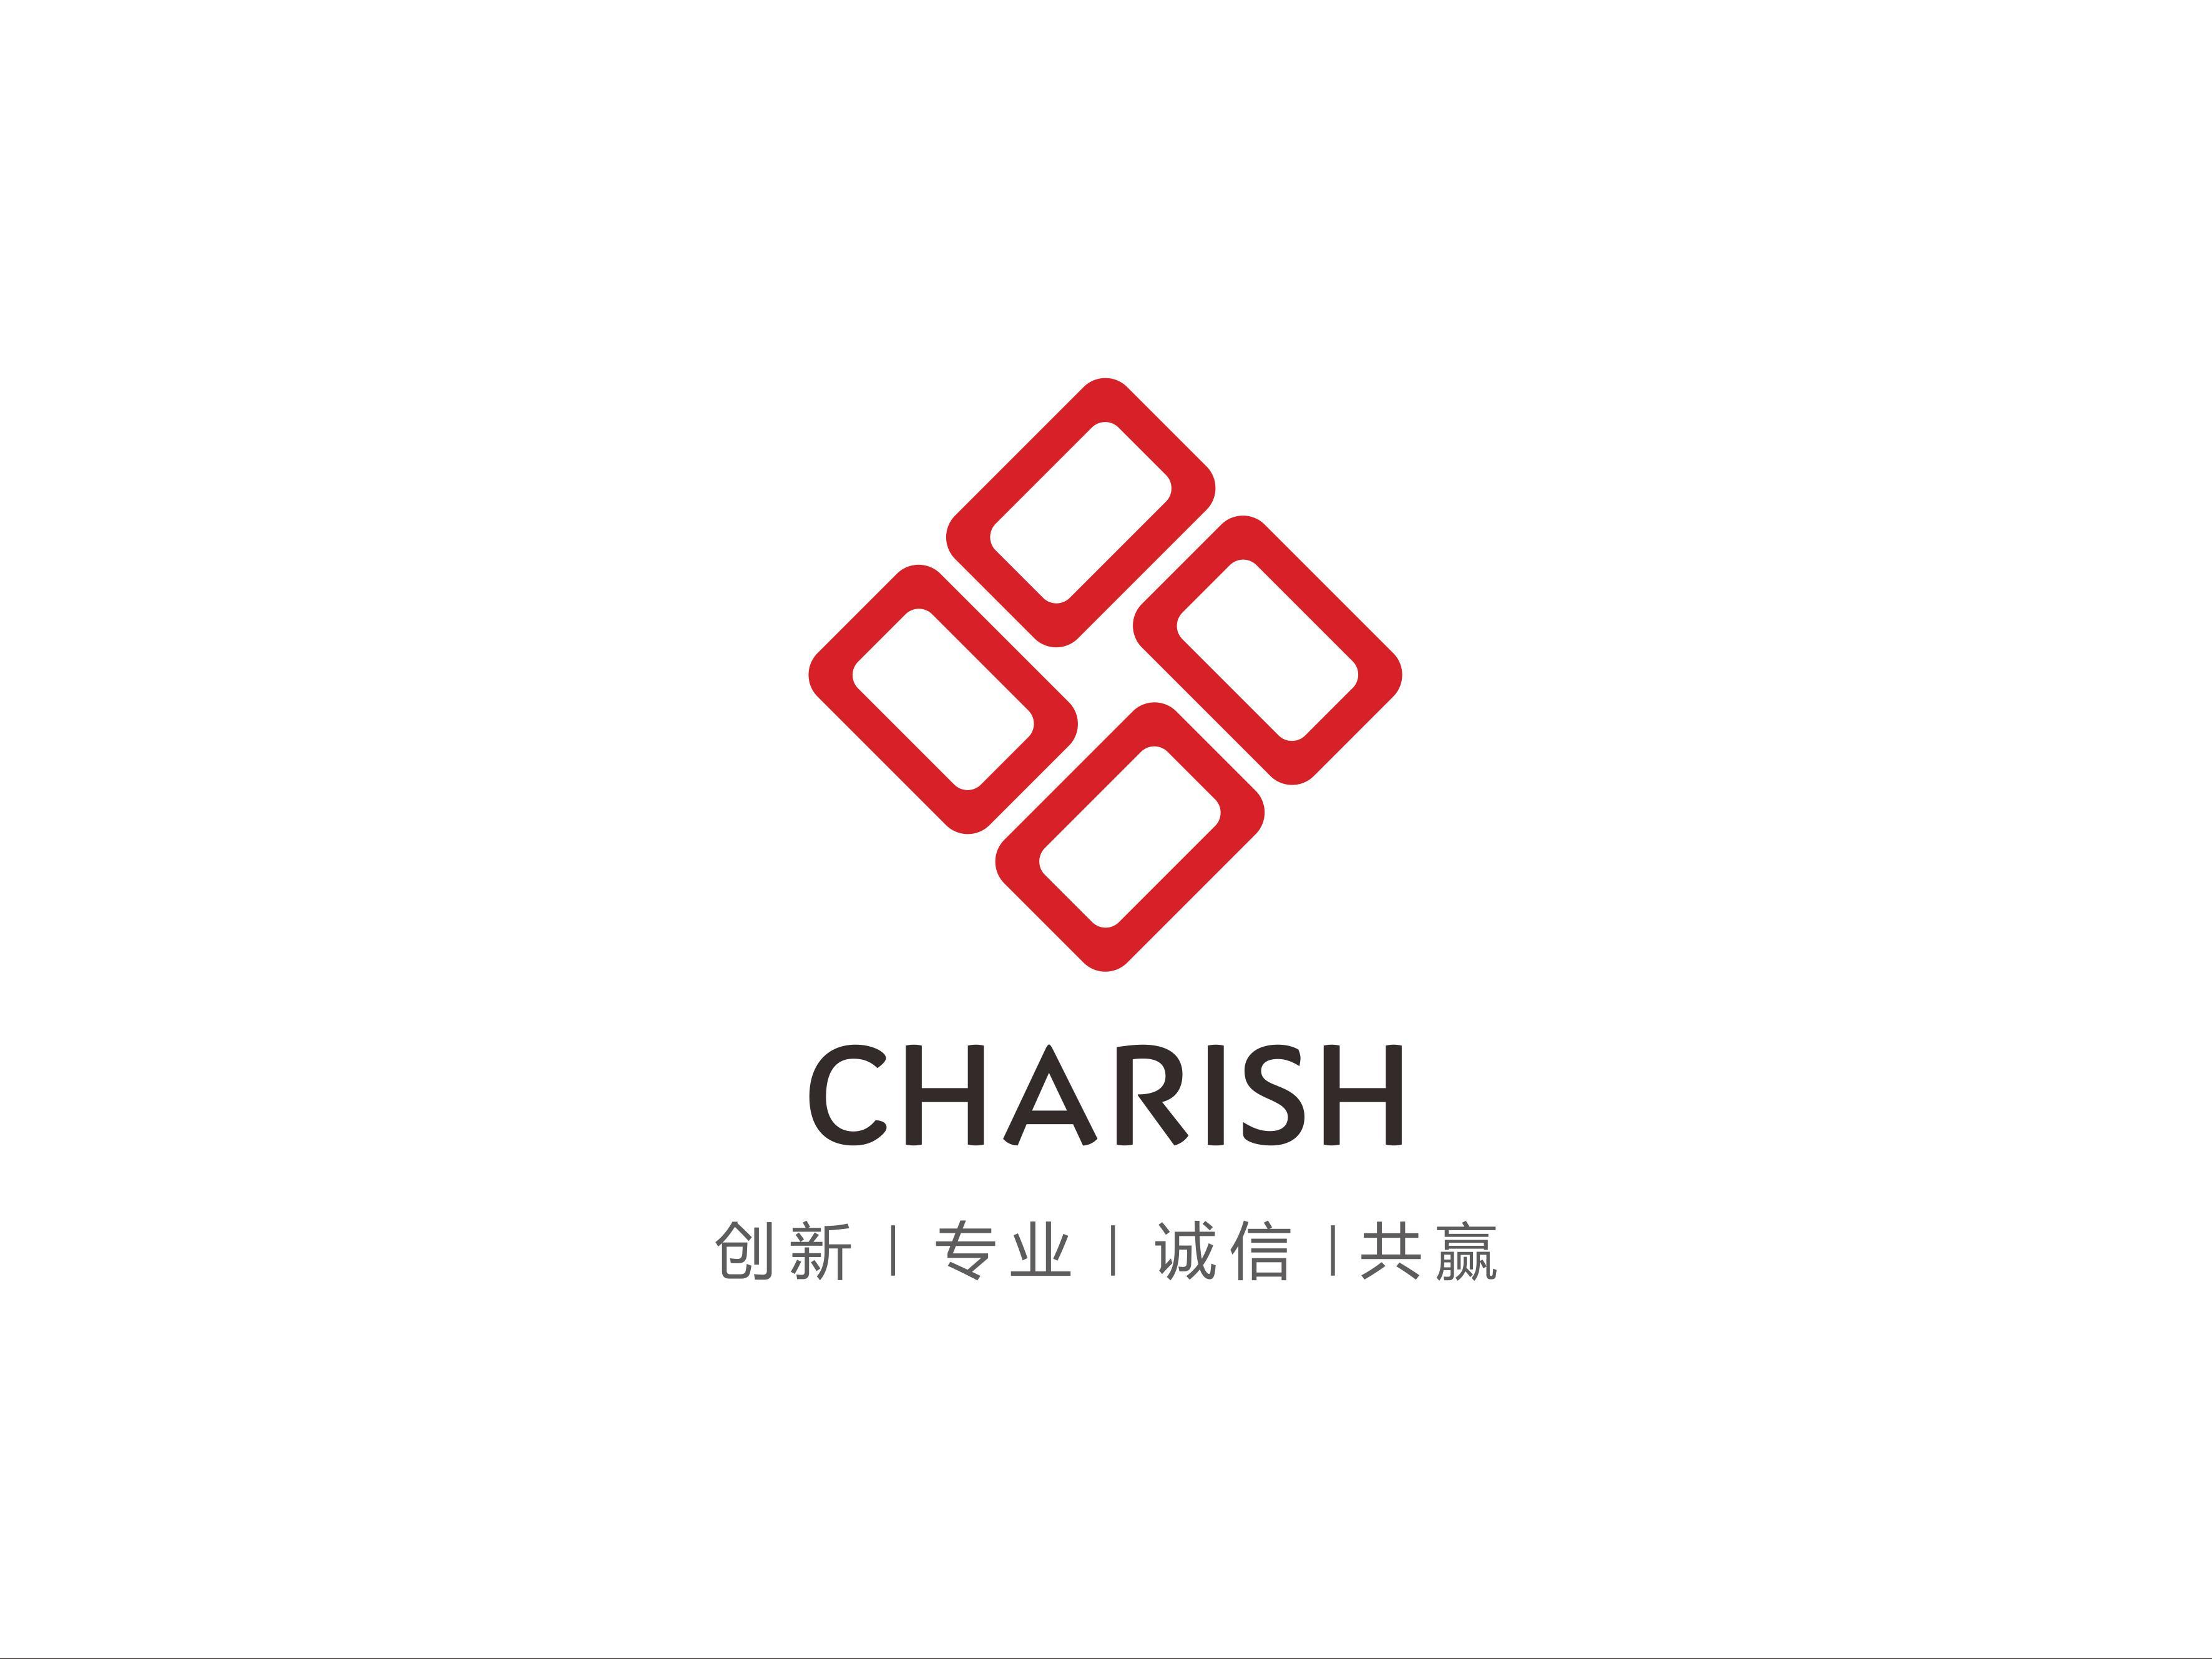 CHARISH公司标准LOGO设计